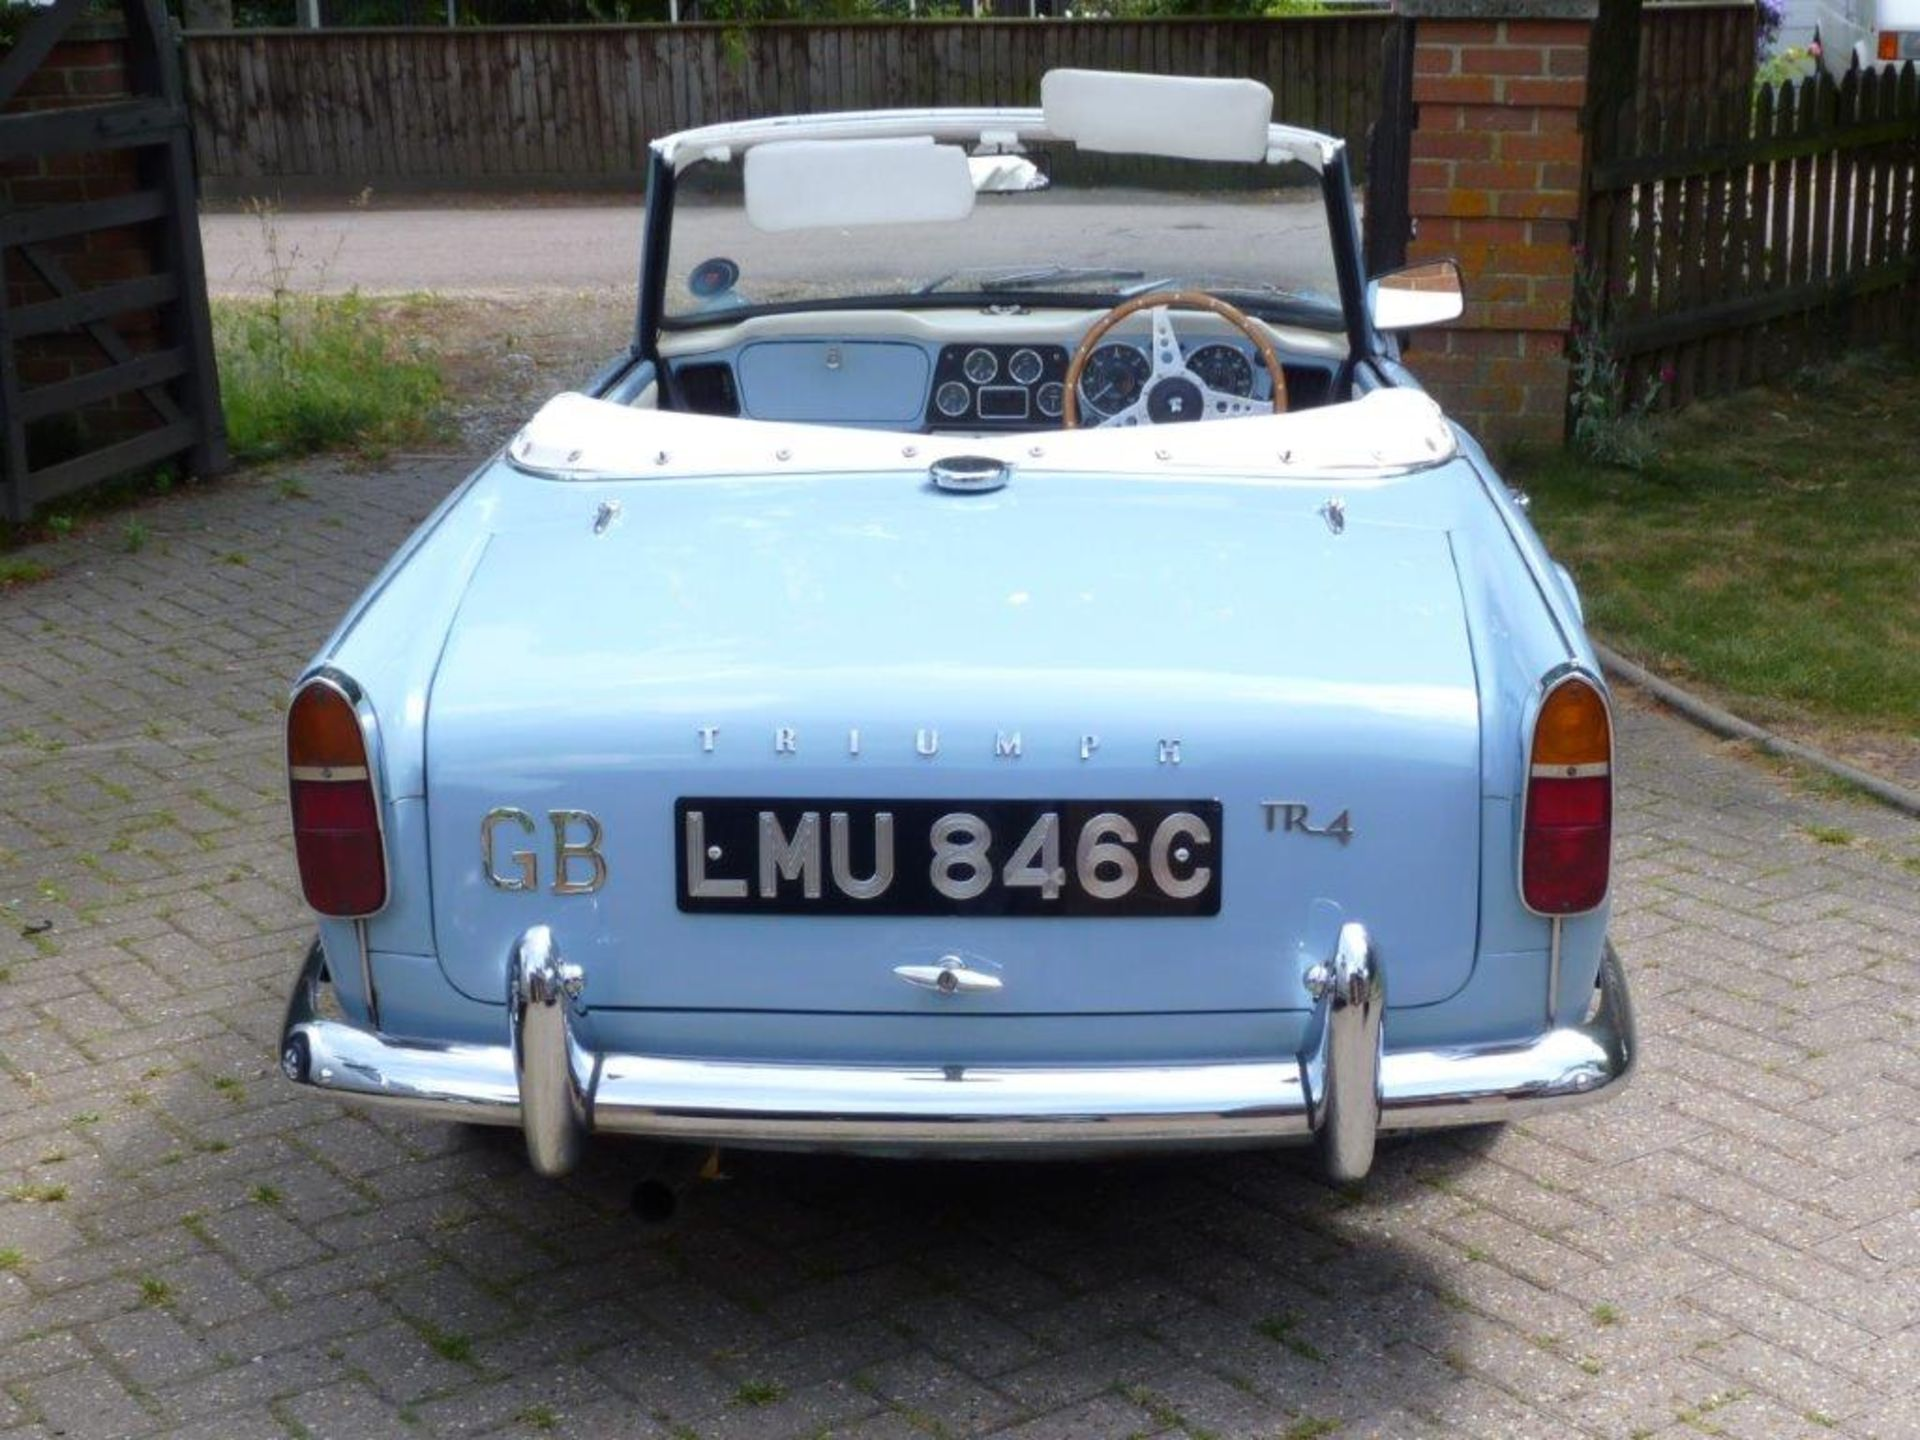 1965 Triumph TR4 - Image 10 of 17